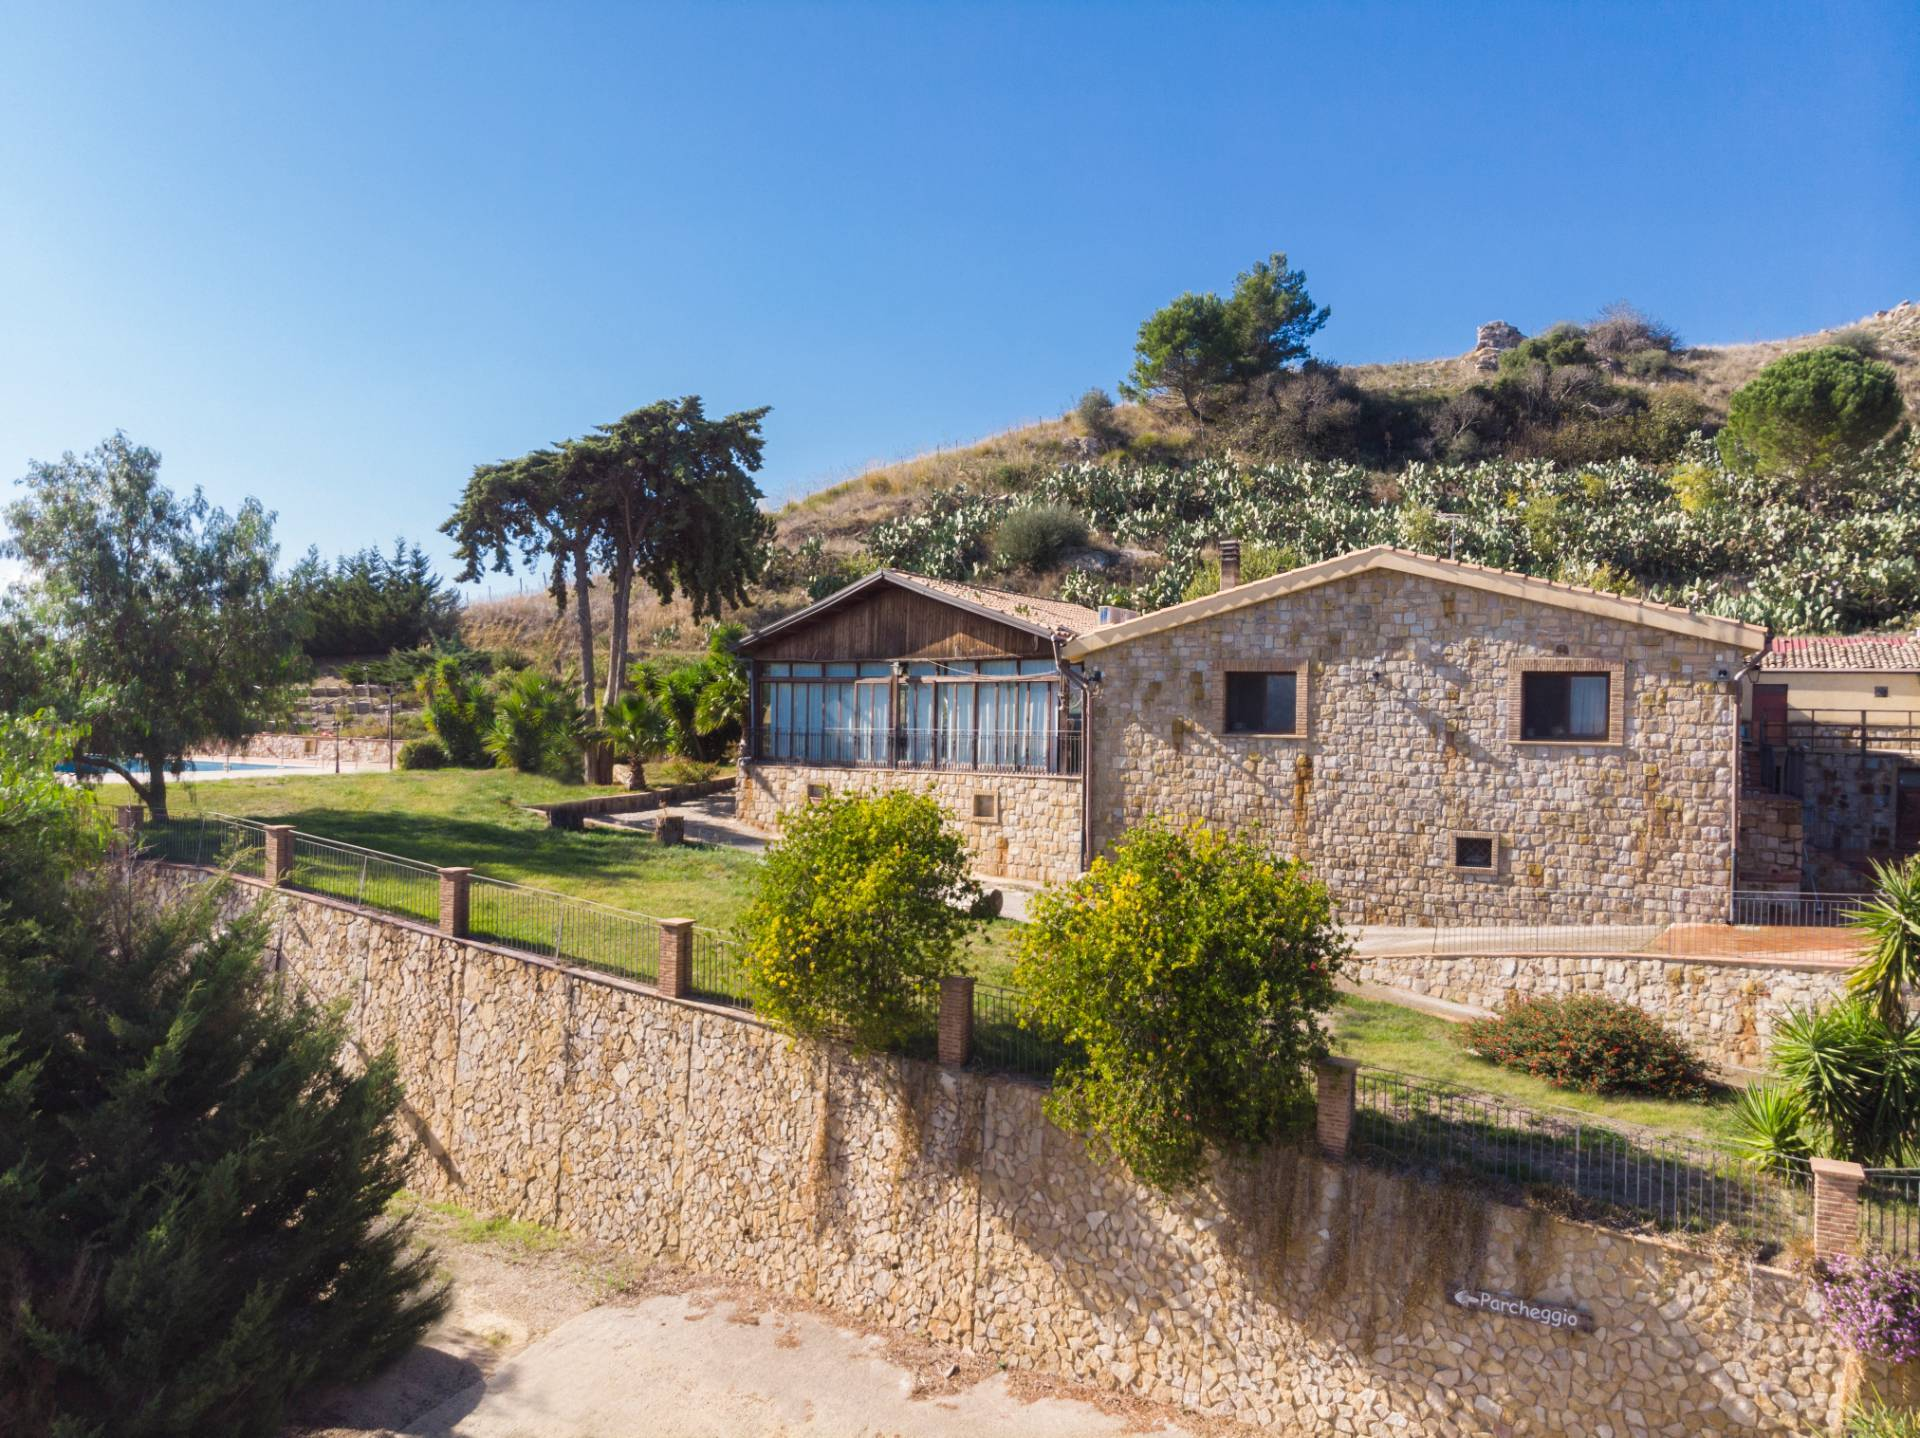 Villa in Vendita a Piazza Armerina: 5 locali, 550 mq - Foto 6